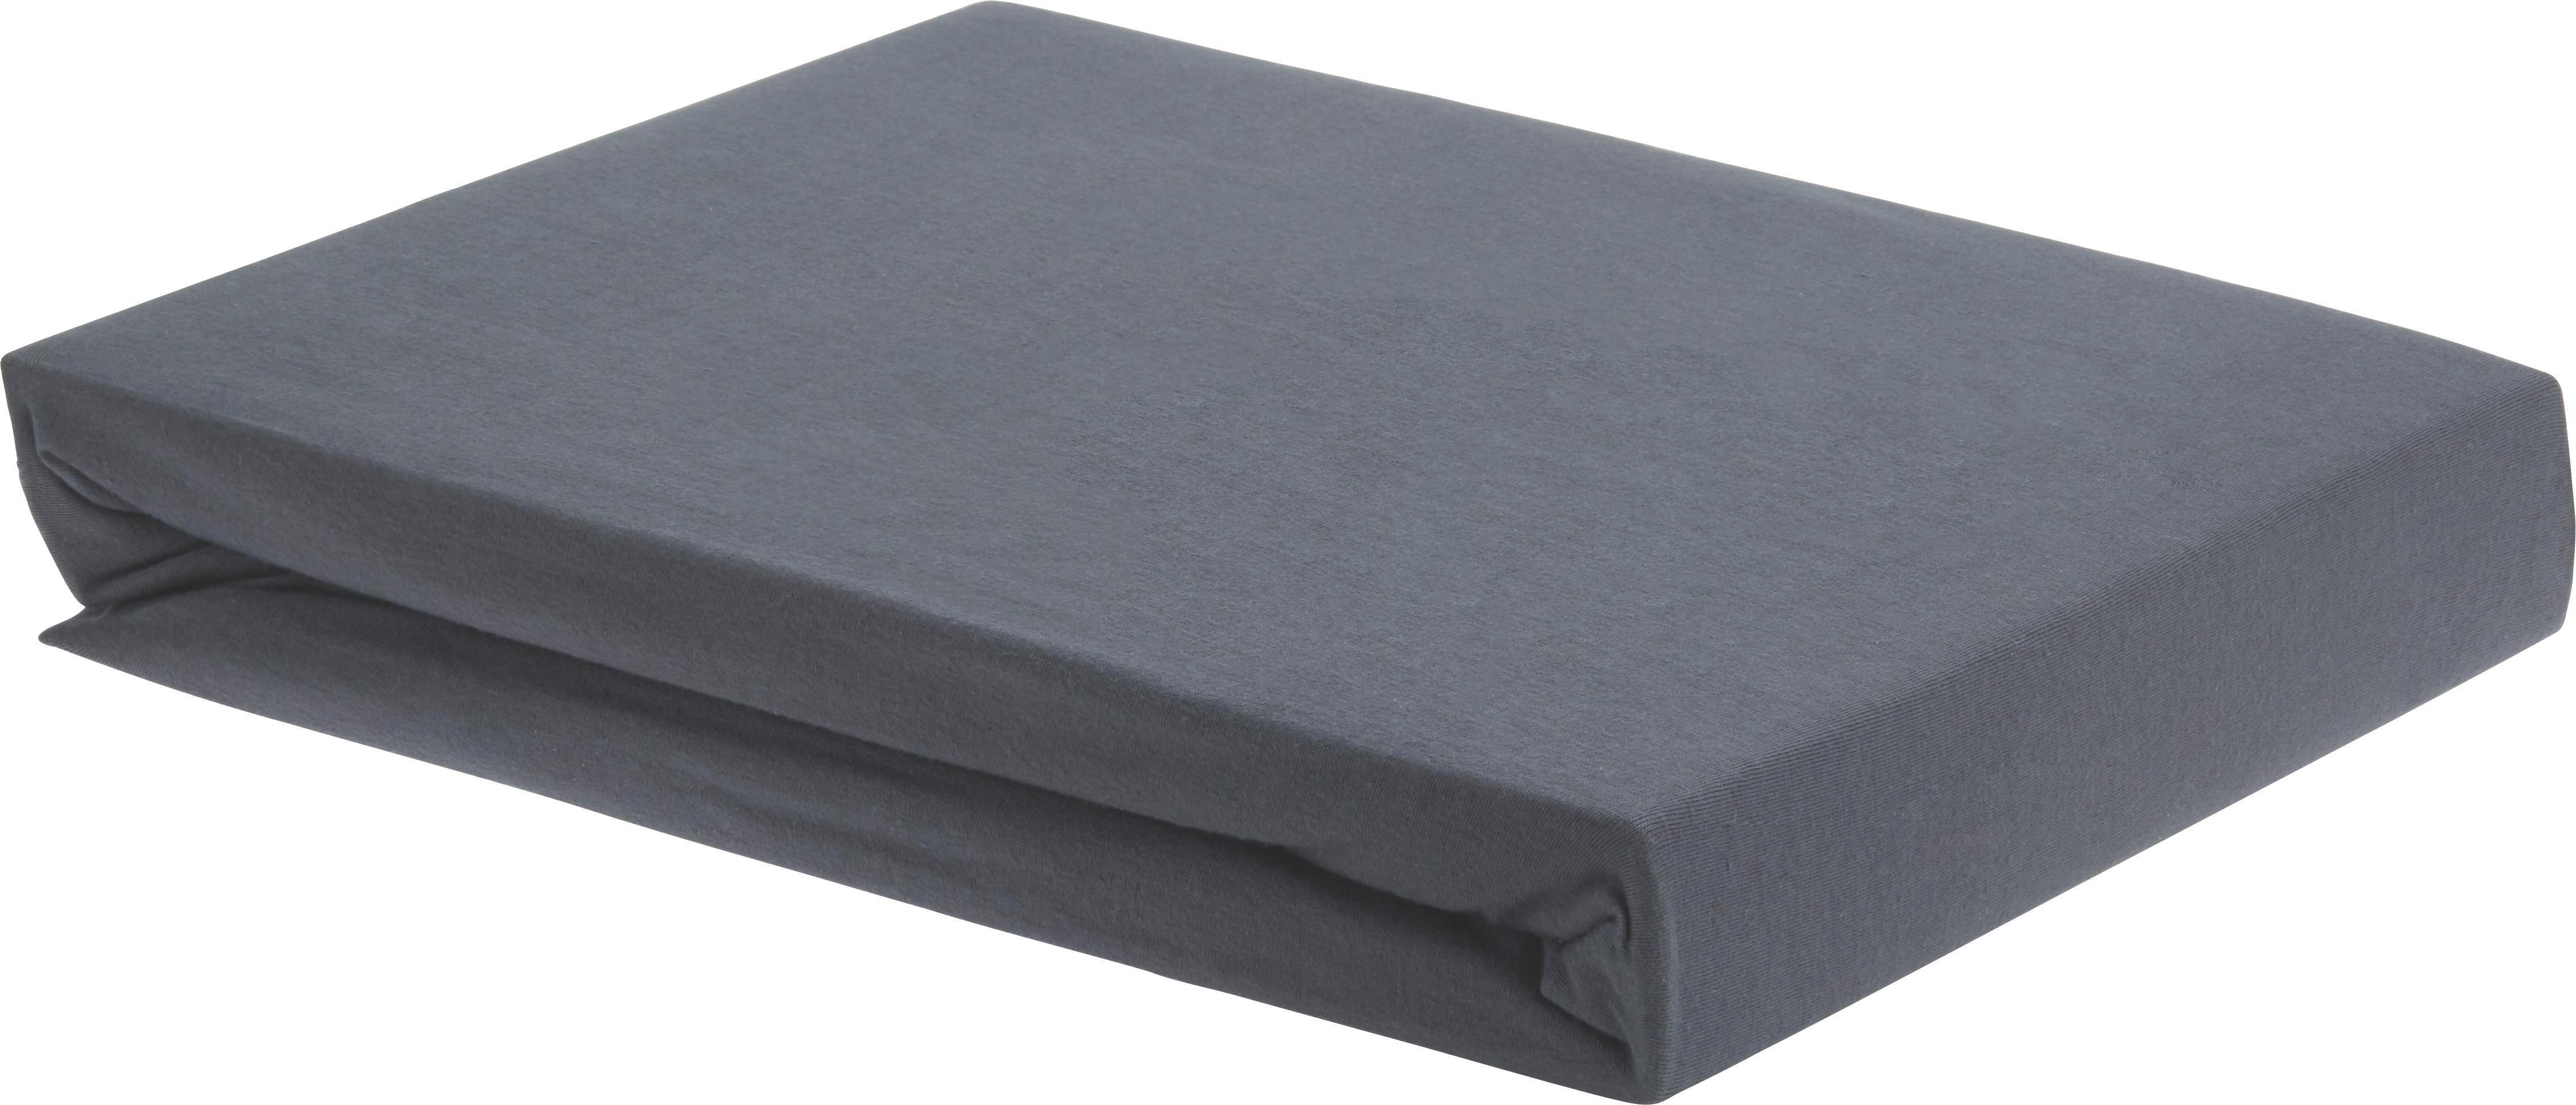 Spannbetttuch Elasthan ca. 100x200cm - Anthrazit, Textil (100/200cm) - PREMIUM LIVING